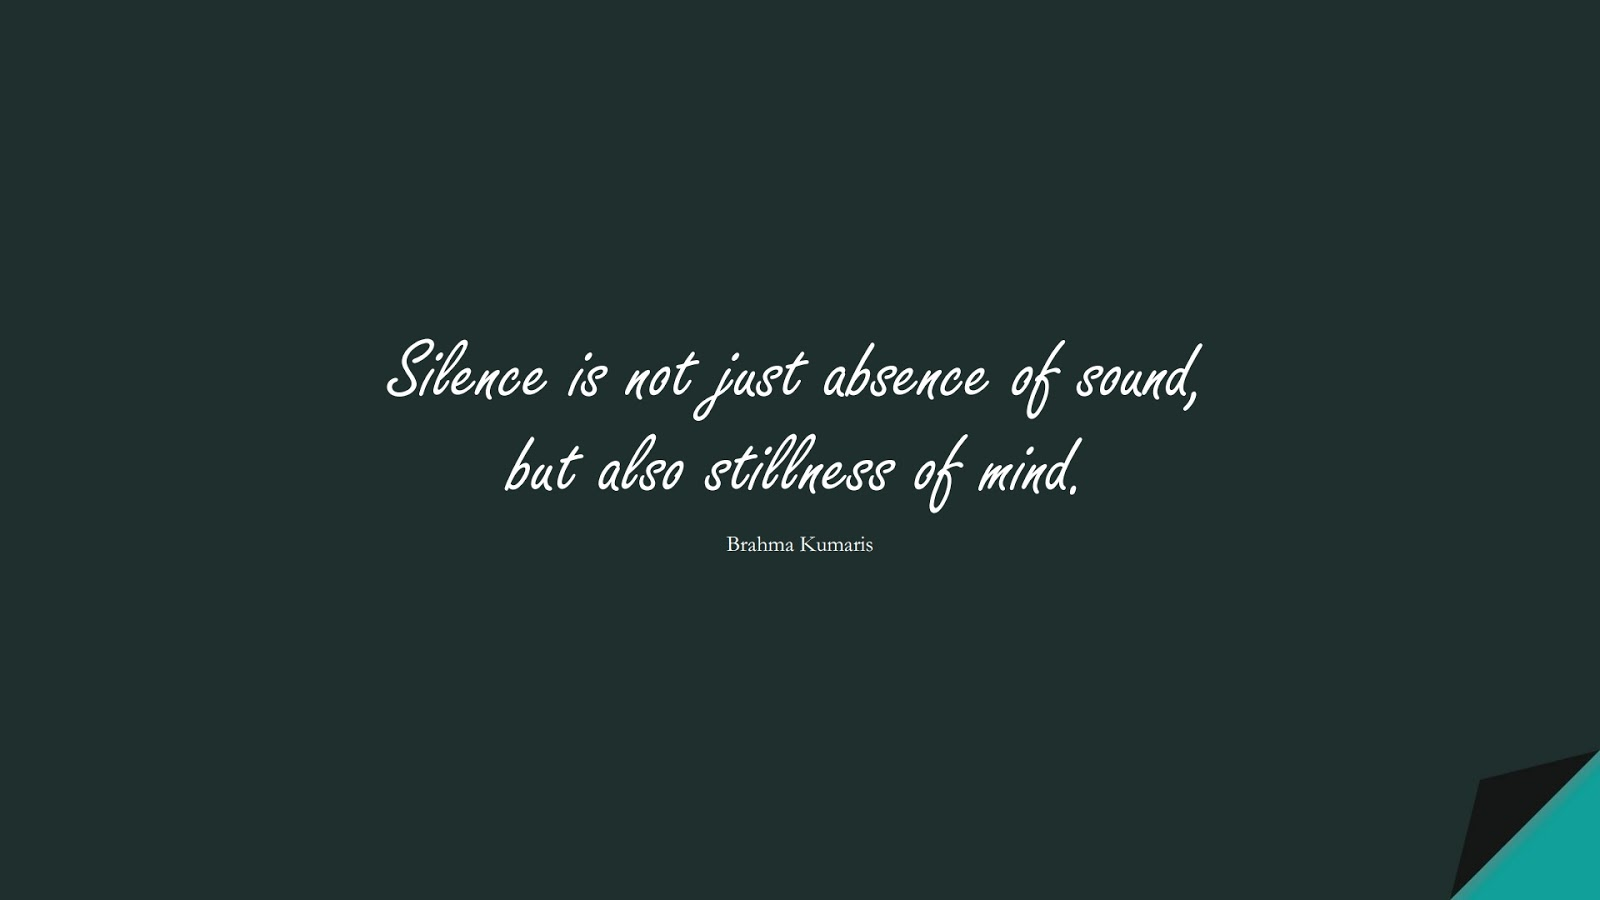 Silence is not just absence of sound, but also stillness of mind. (Brahma Kumaris);  #CalmQuotes